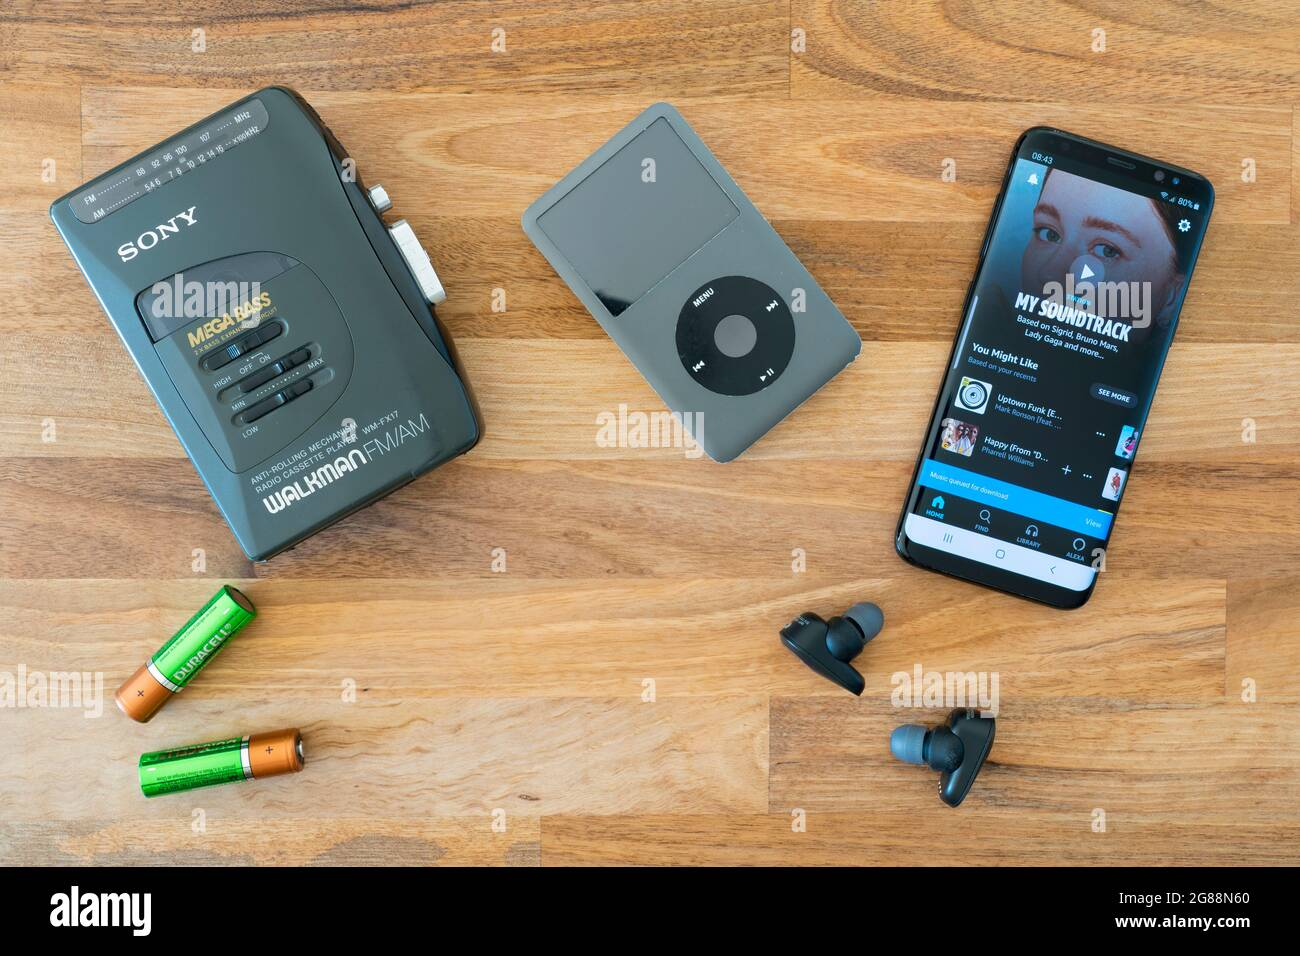 evolving-portable-music-technology-an-ob